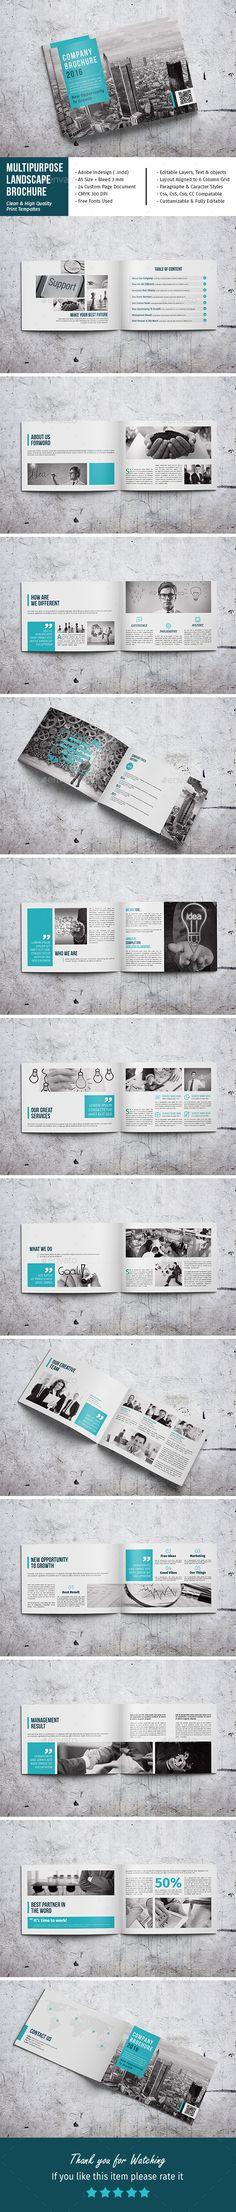 Multipurpose Landscape Brochure — InDesign INDD #brochure #magazine • Available here → https://graphicriver.net/item/multipurpose-landscape-brochure/19501107?ref=pxcr